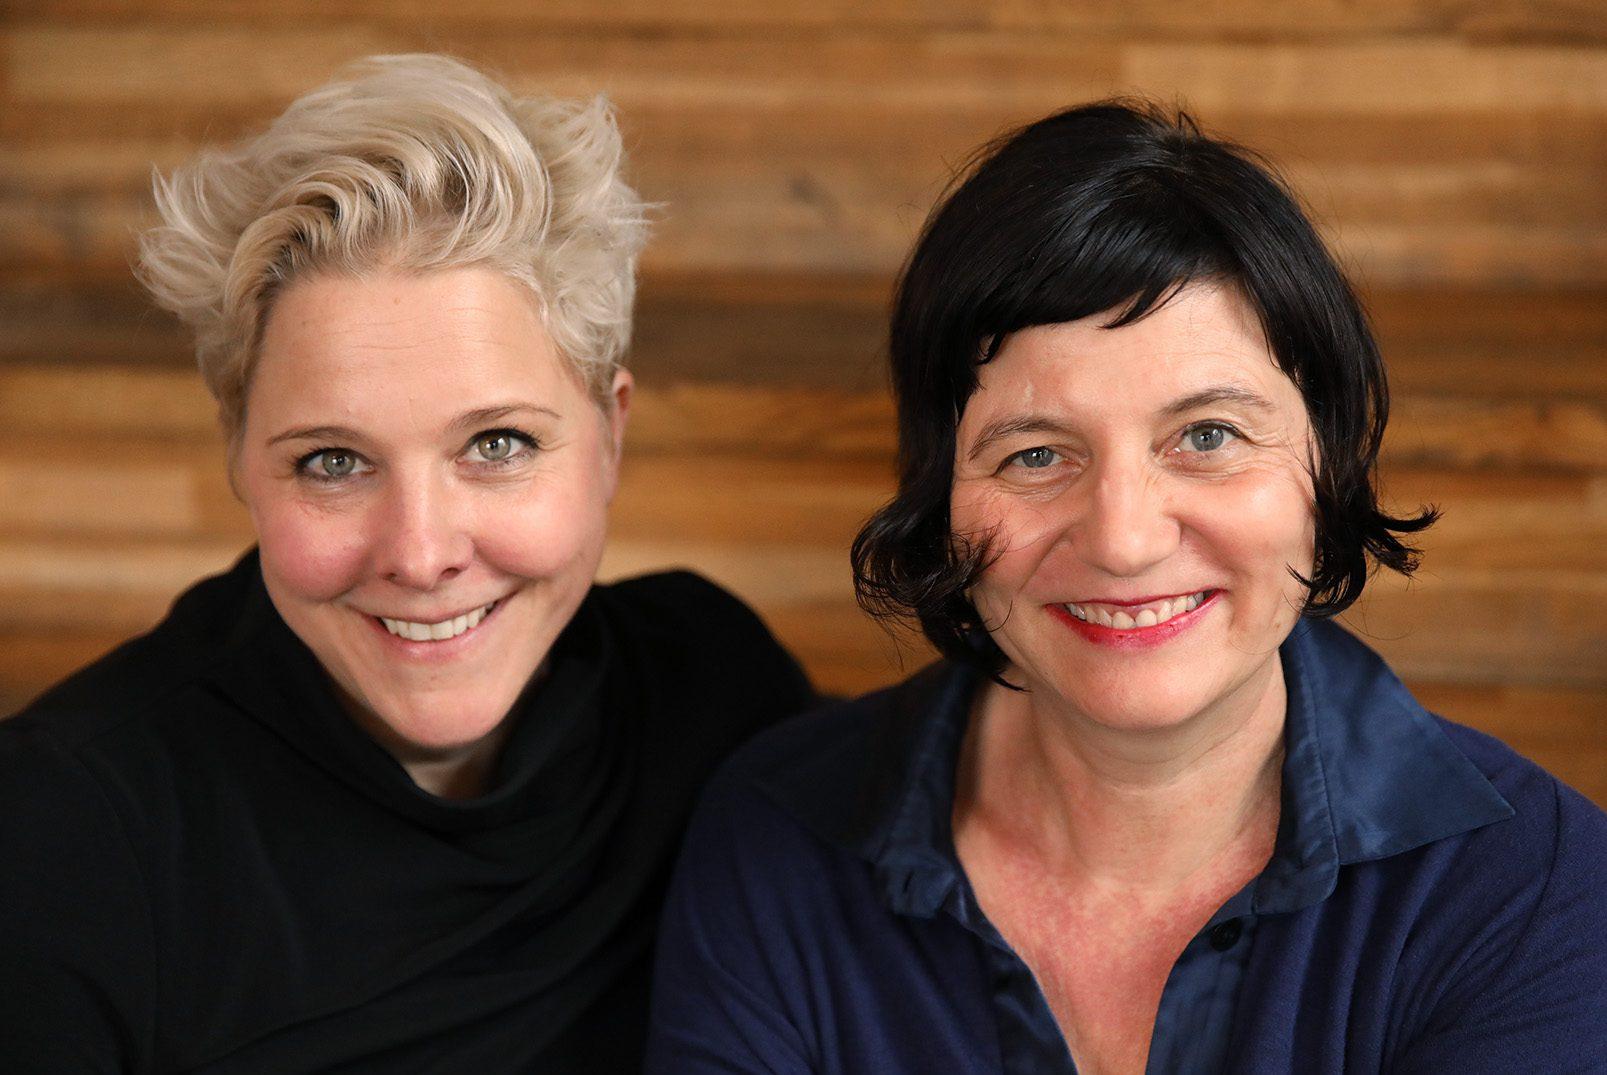 Katja Anclam und Franziska Weißbach